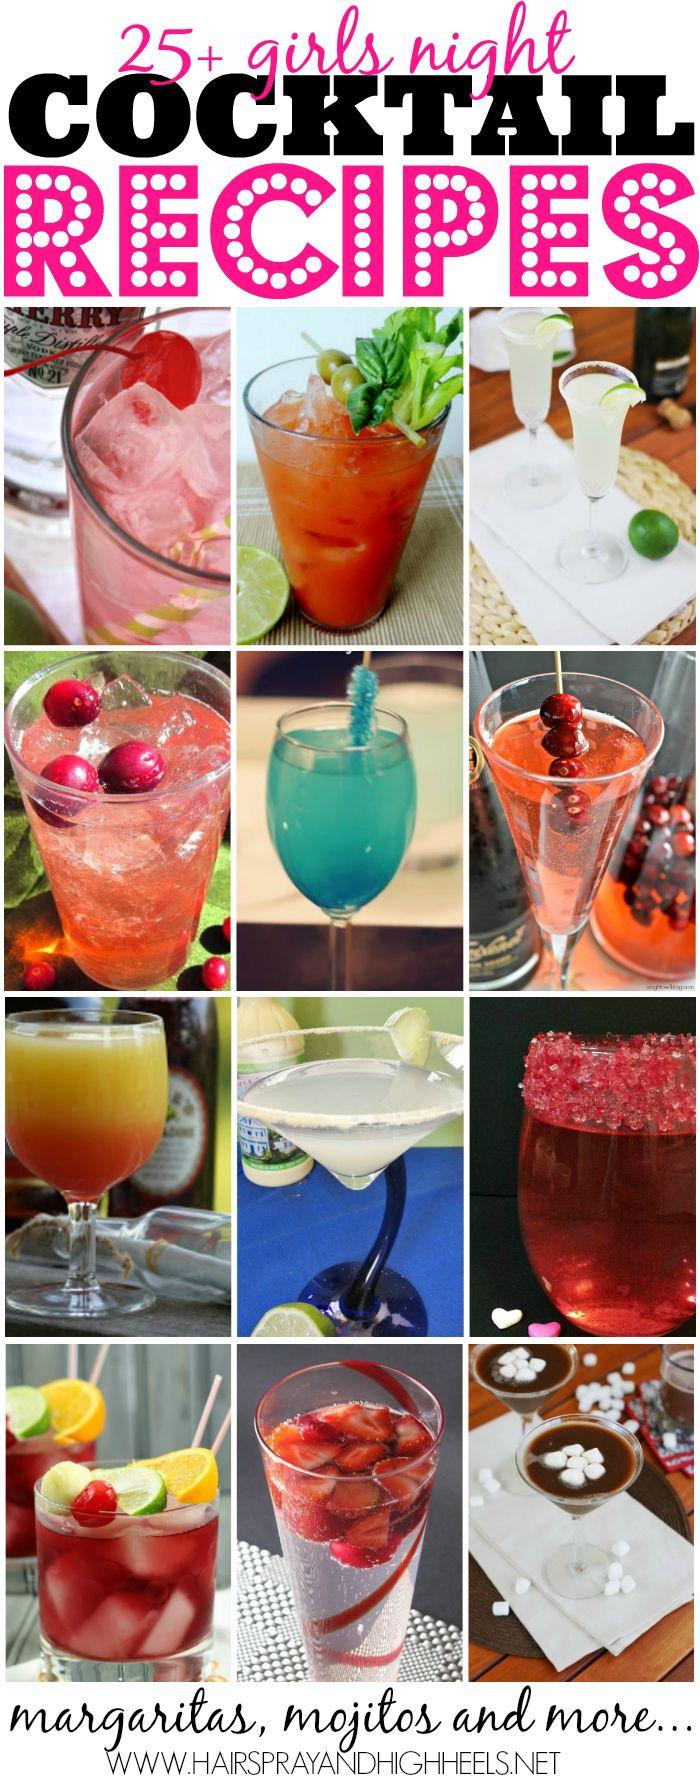 25 Girls Night Cocktail Recipes  via www.hairsprayandhighheels.com @Krista Knight and HighHeels